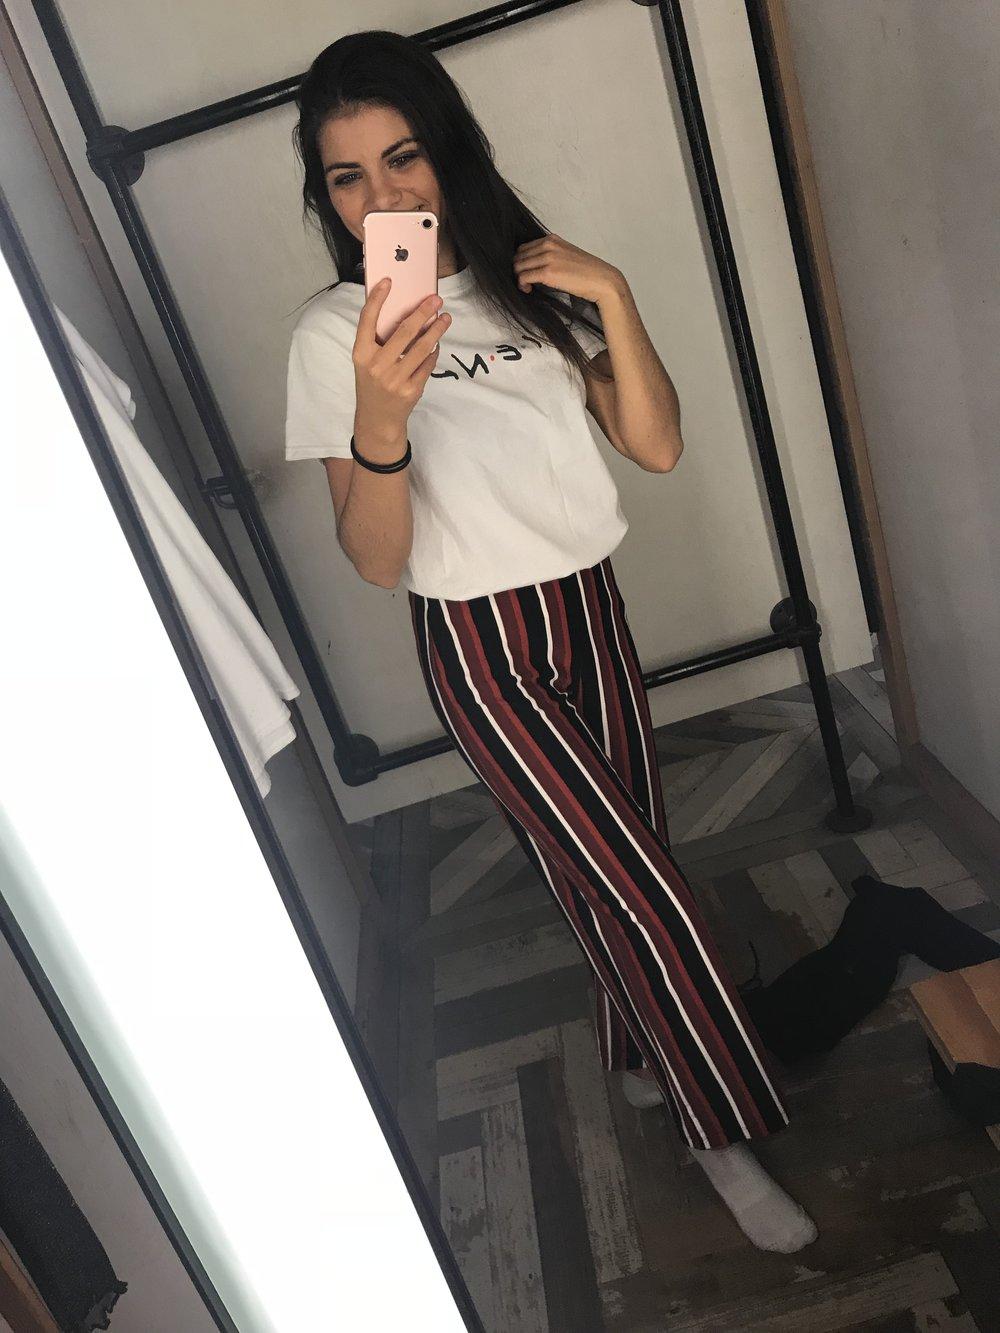 tee shirt / pants